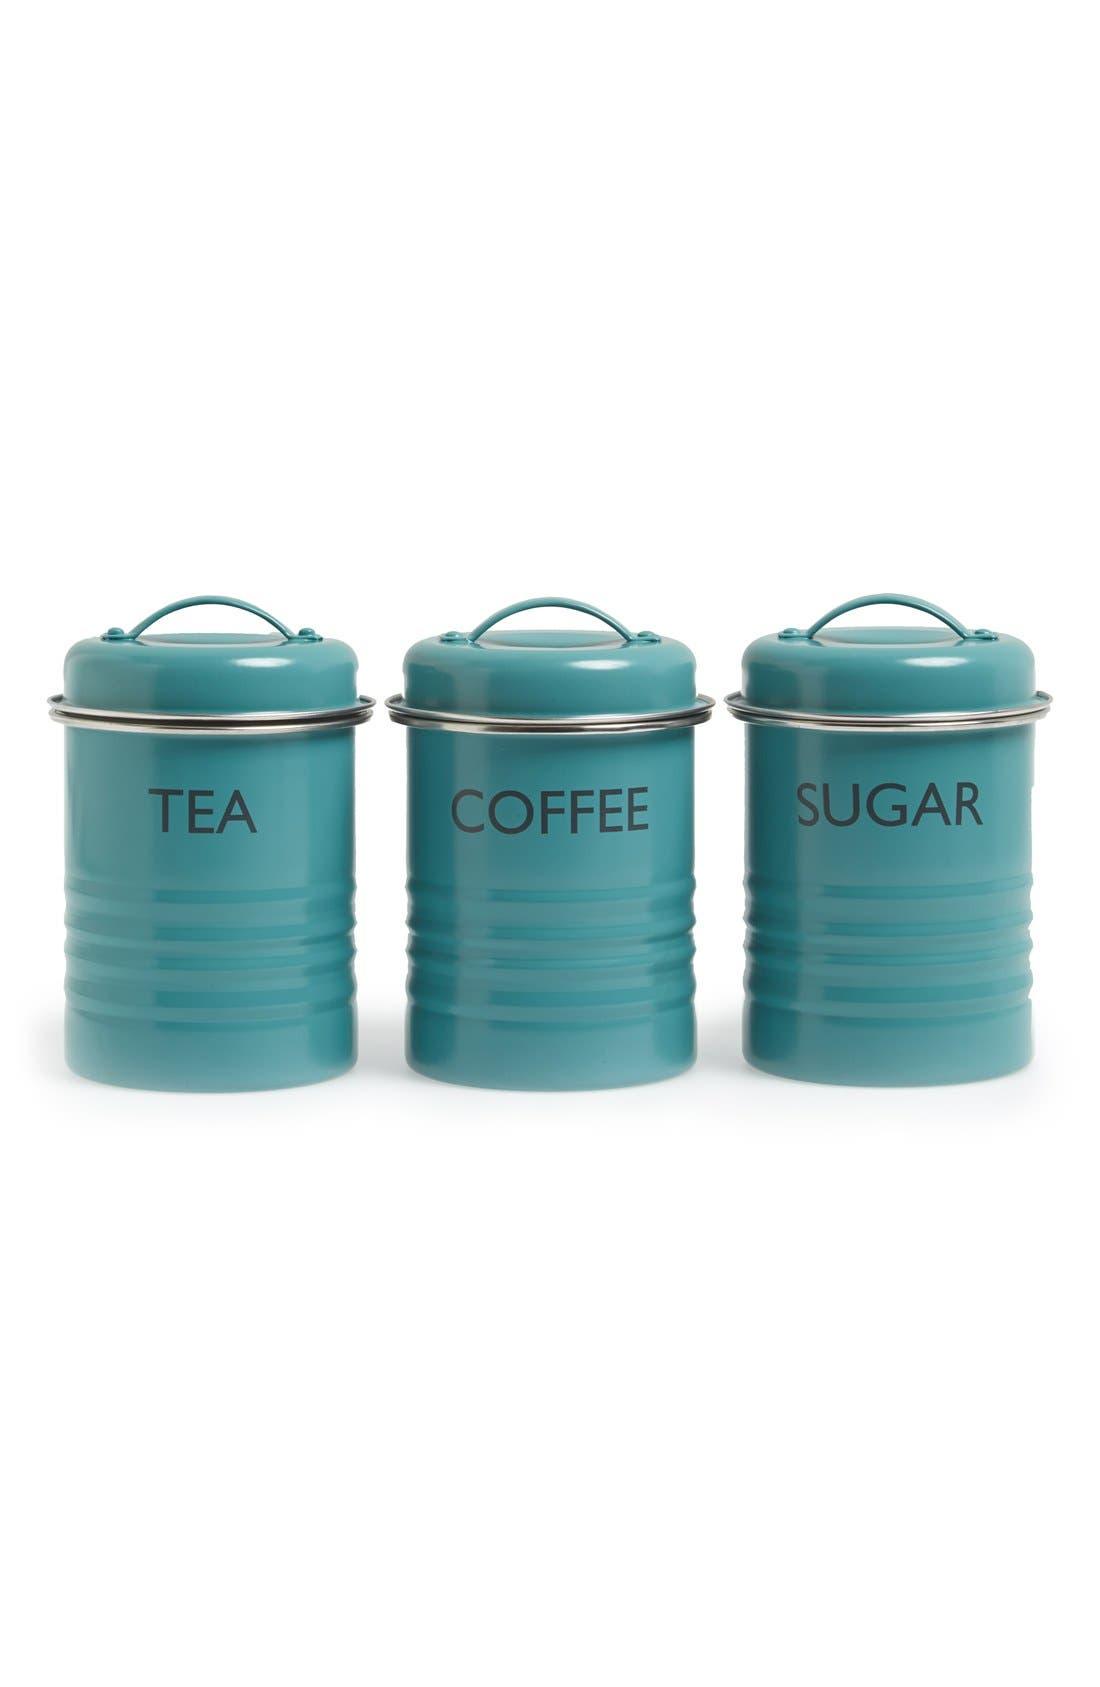 Main Image - Typhoon 'Vintage Kitchen - Summer House' Enamel Tea, Coffee & Sugar Storage Canisters (Set of 3)